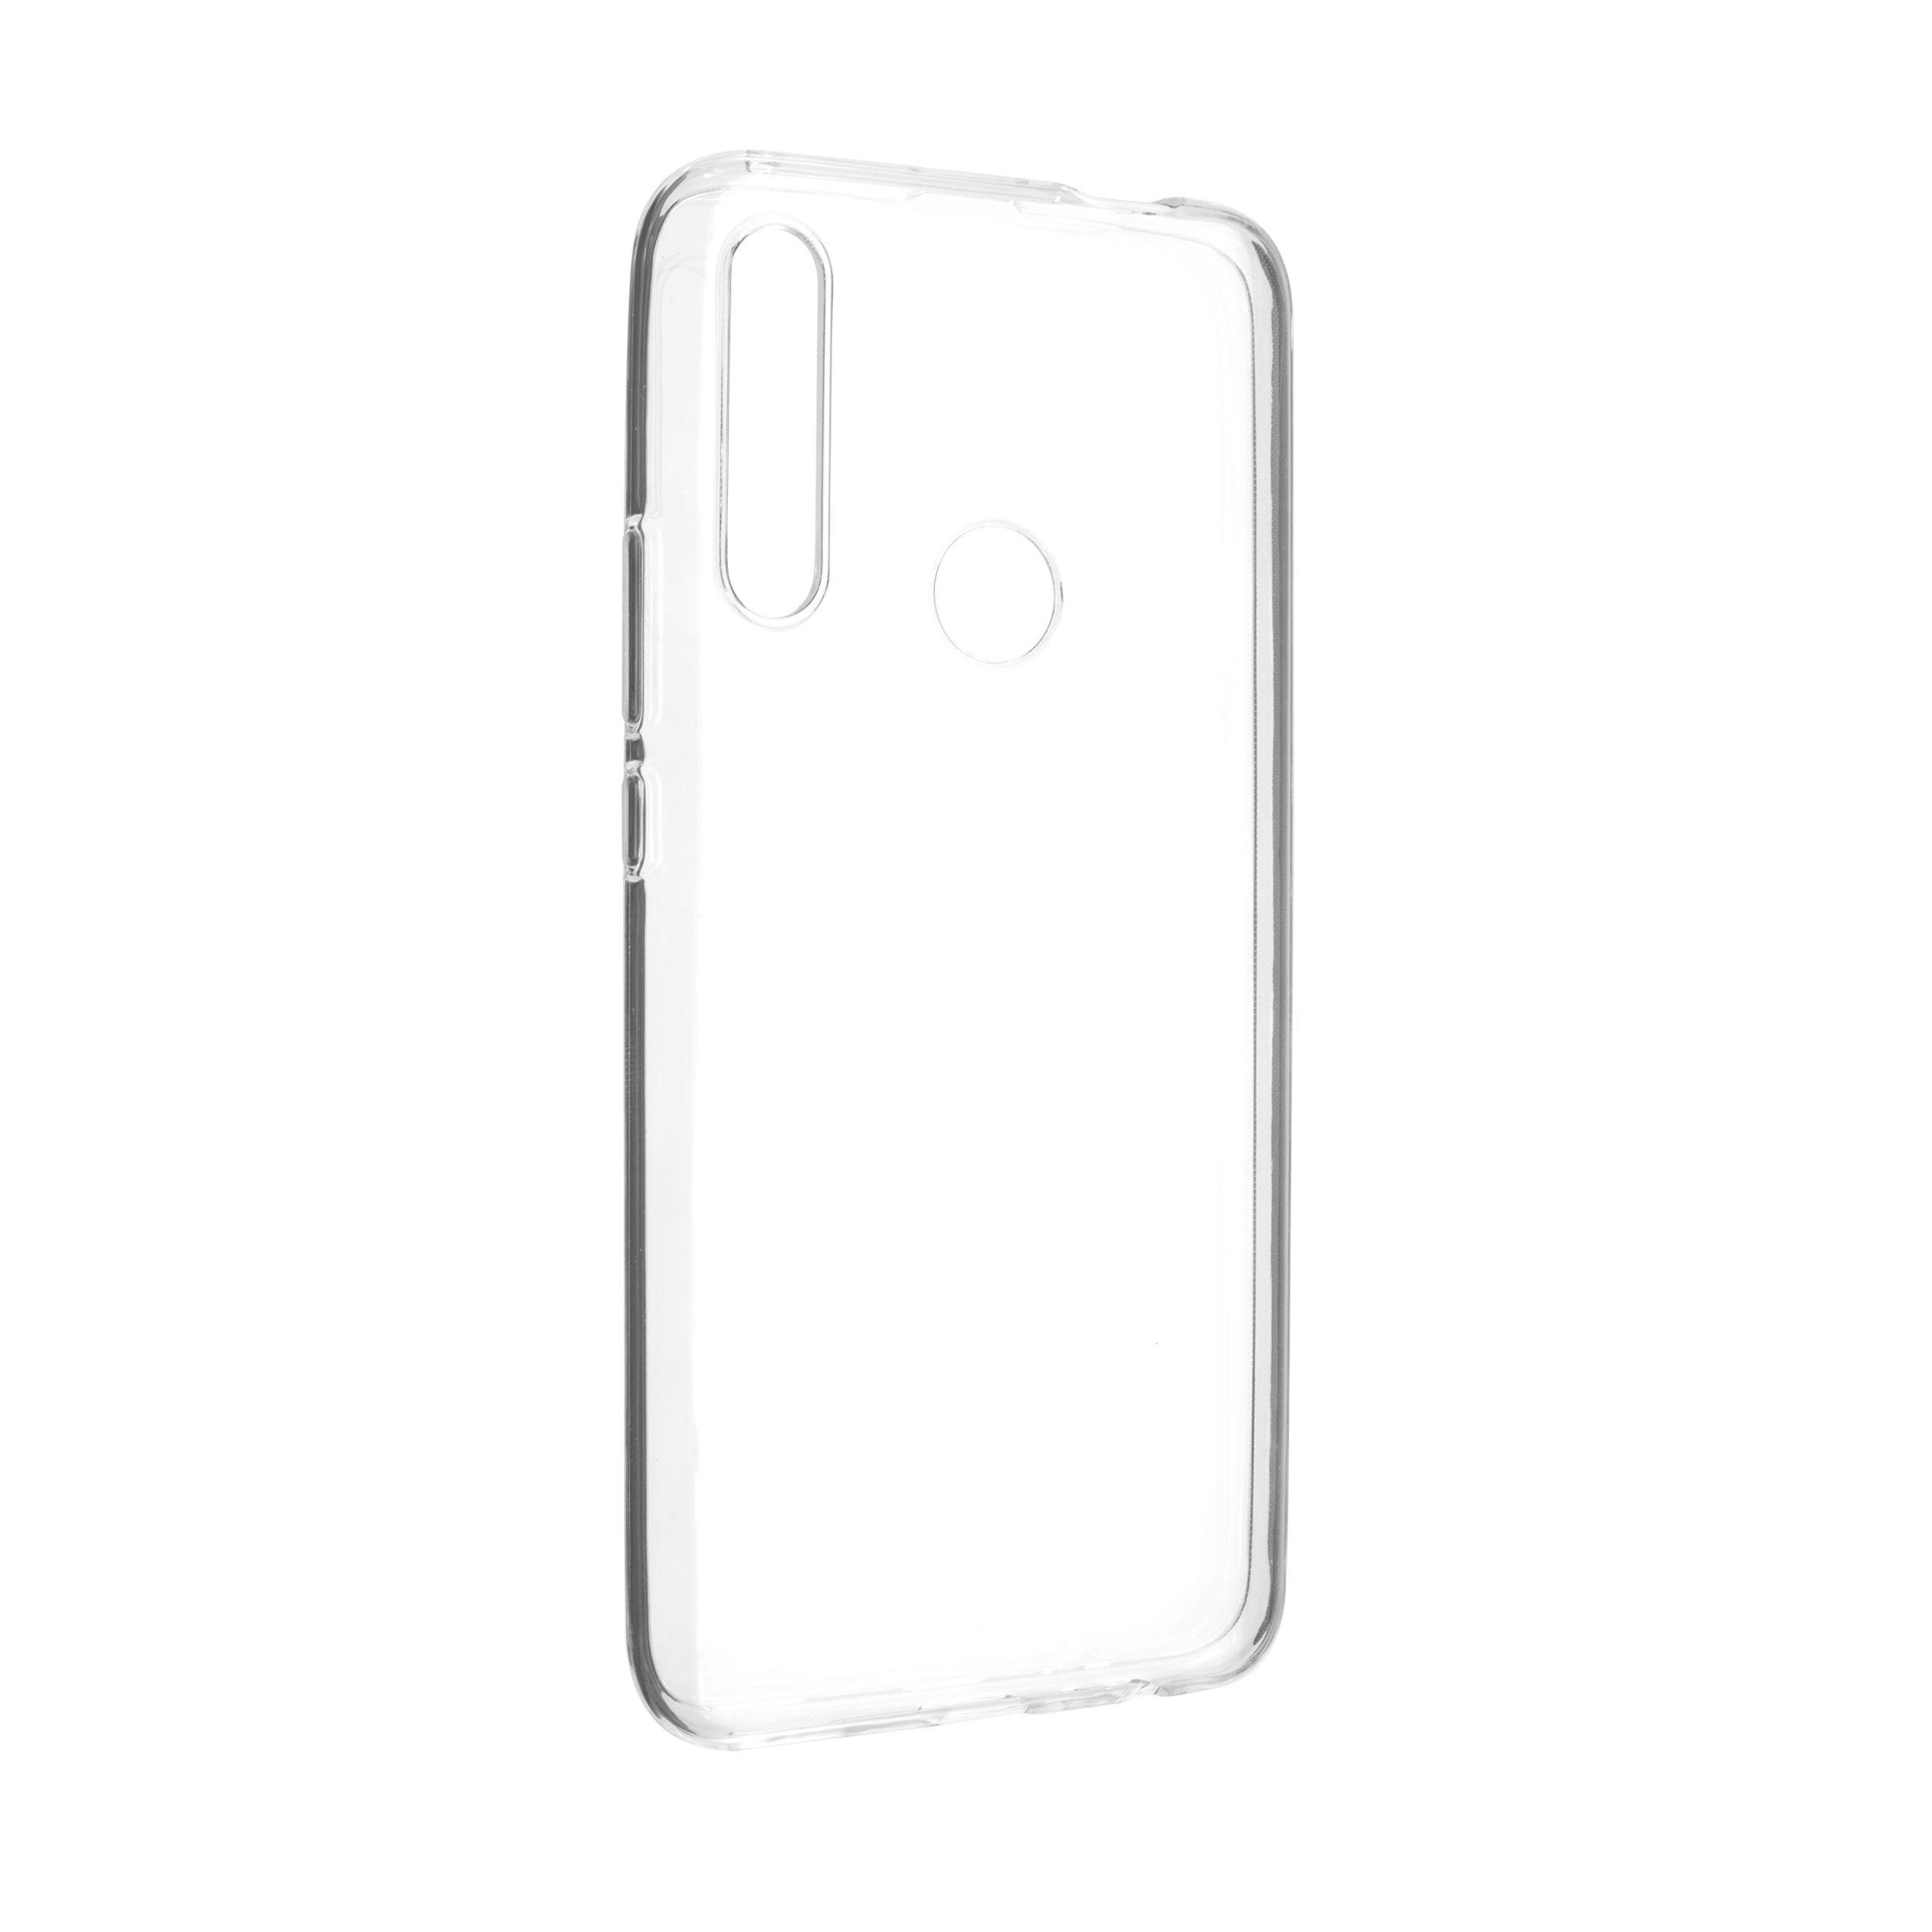 Ultratenké TPU gelové pouzdro FIXED Skin pro Huawei Y9 Prime (2019), 0,6 mm, čiré